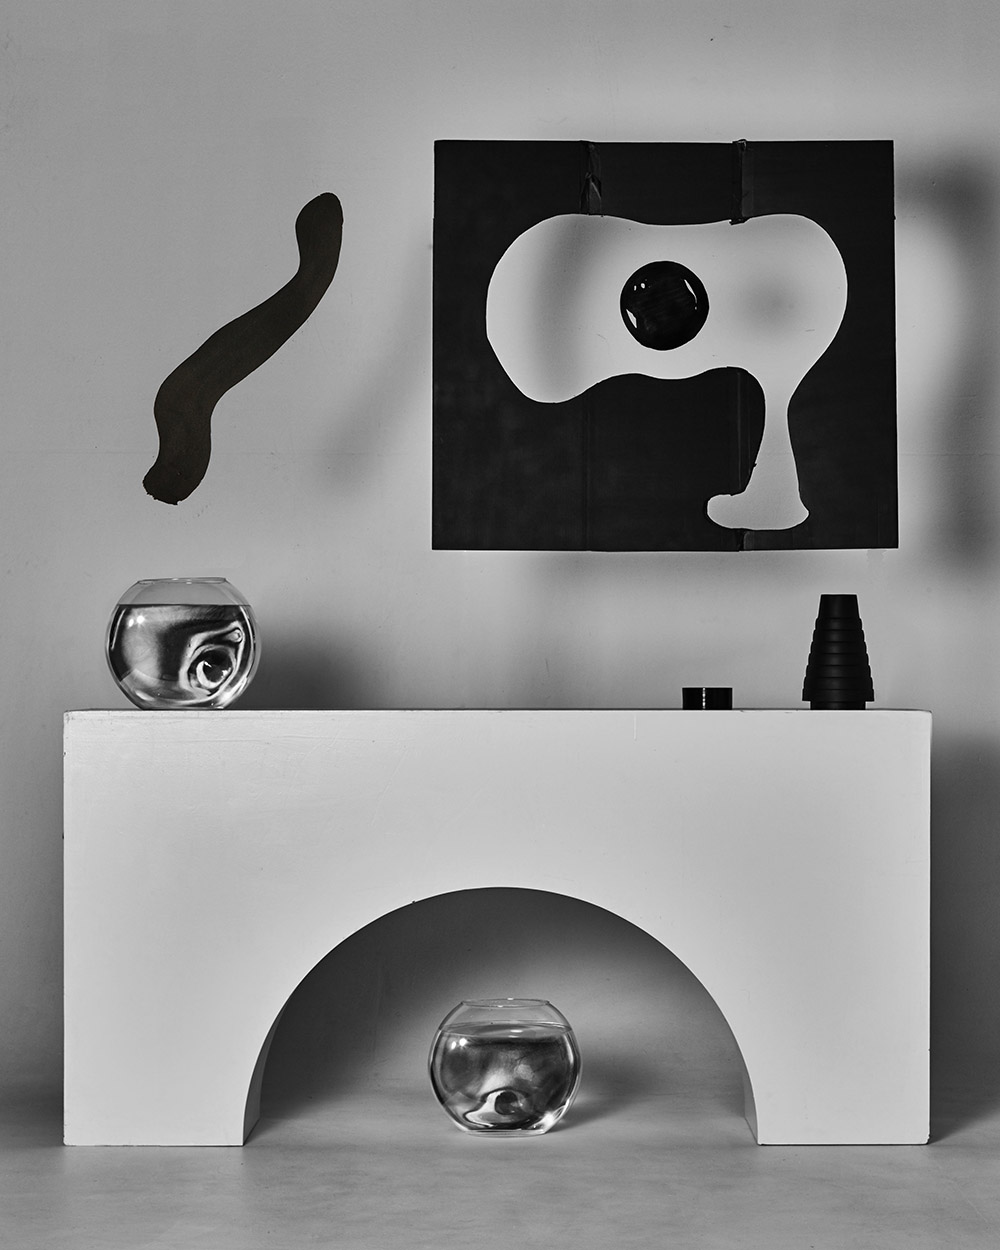 Kyu Sang Lee Ein kleines Nachtfoto No.1 2018 Hahnehmuhle Baryta 12 x 15 cm